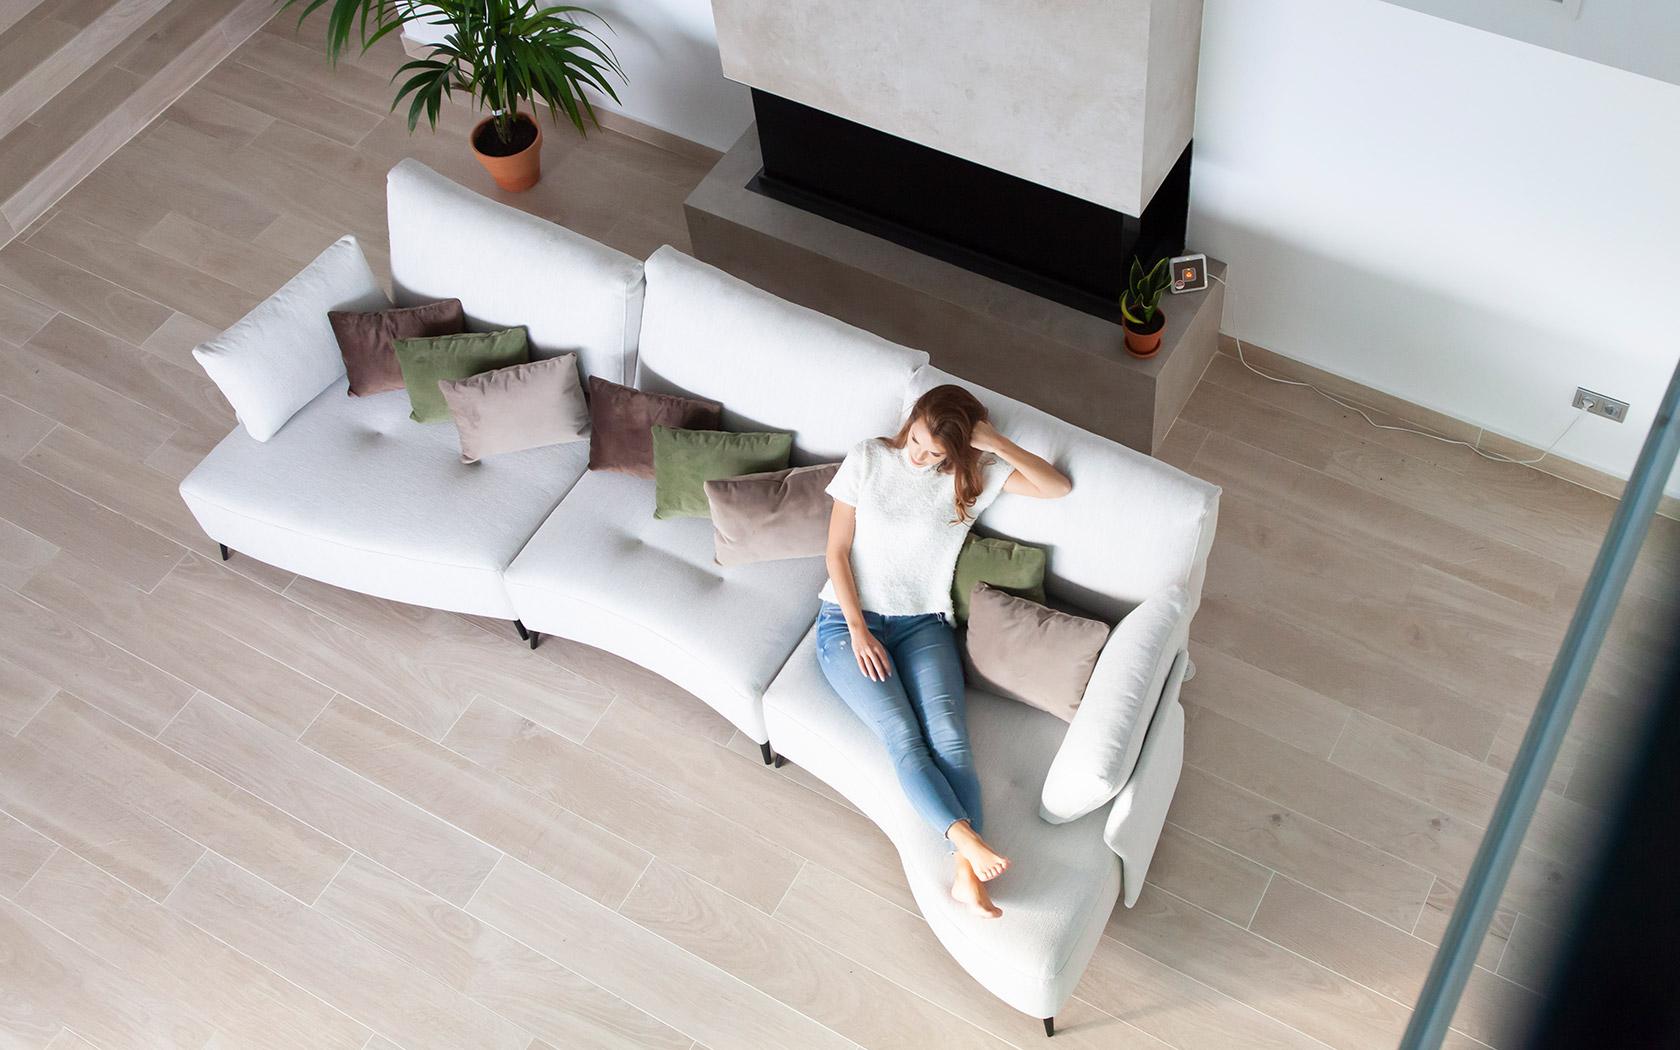 kalahari sofa 2021 16